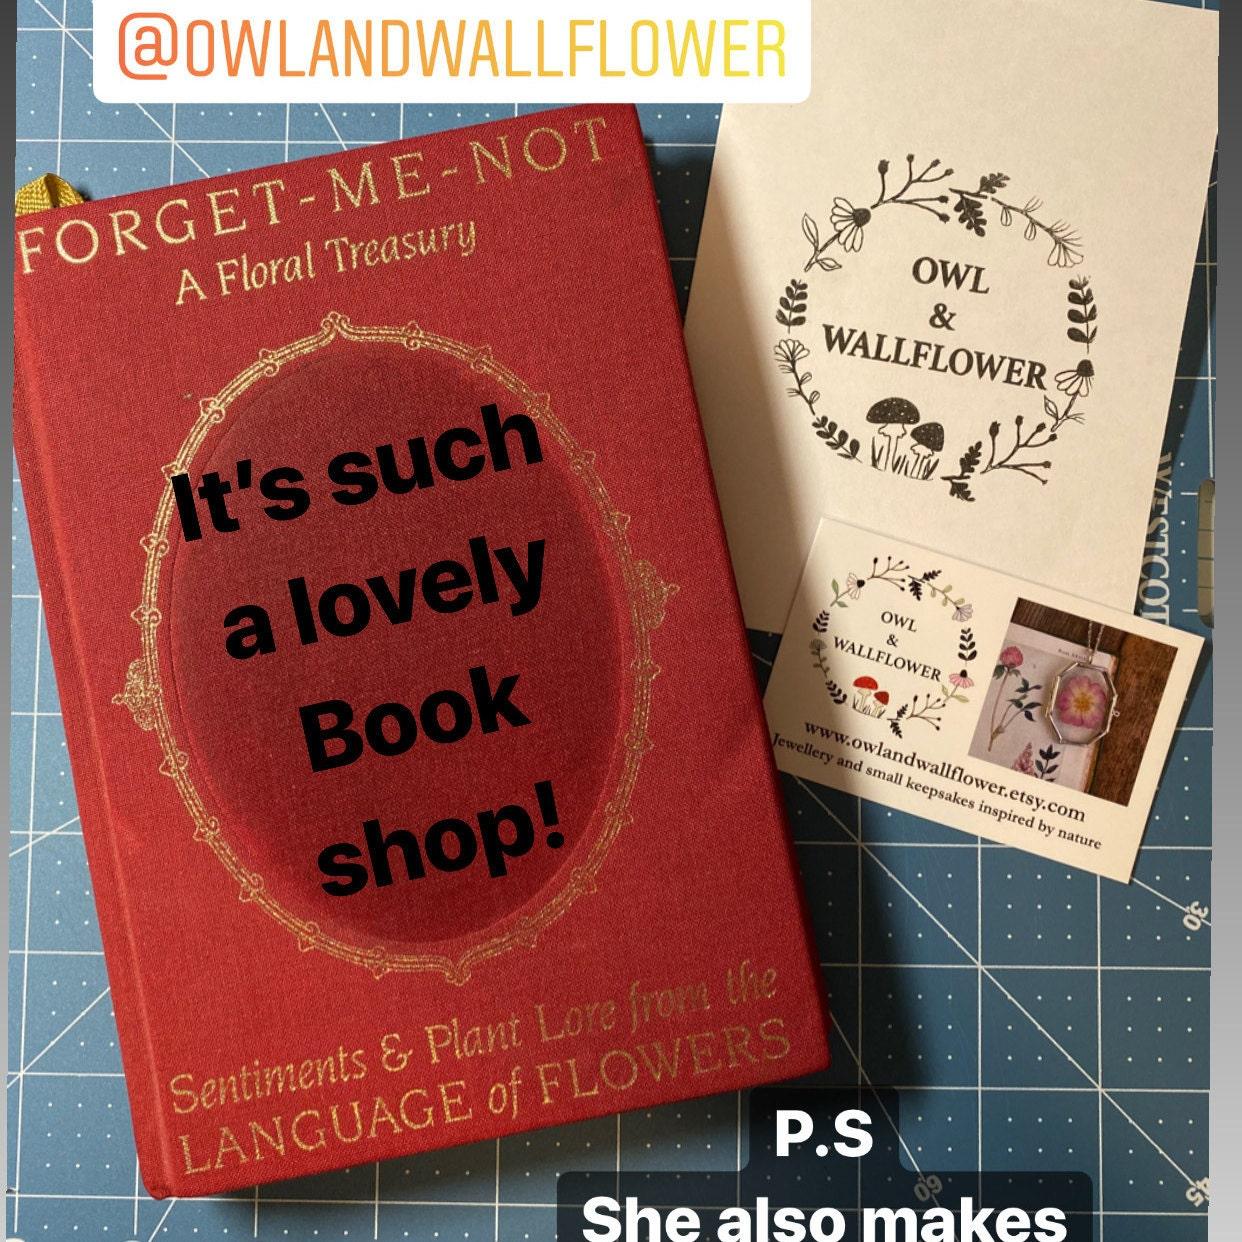 Lara fredrick added a photo of their purchase